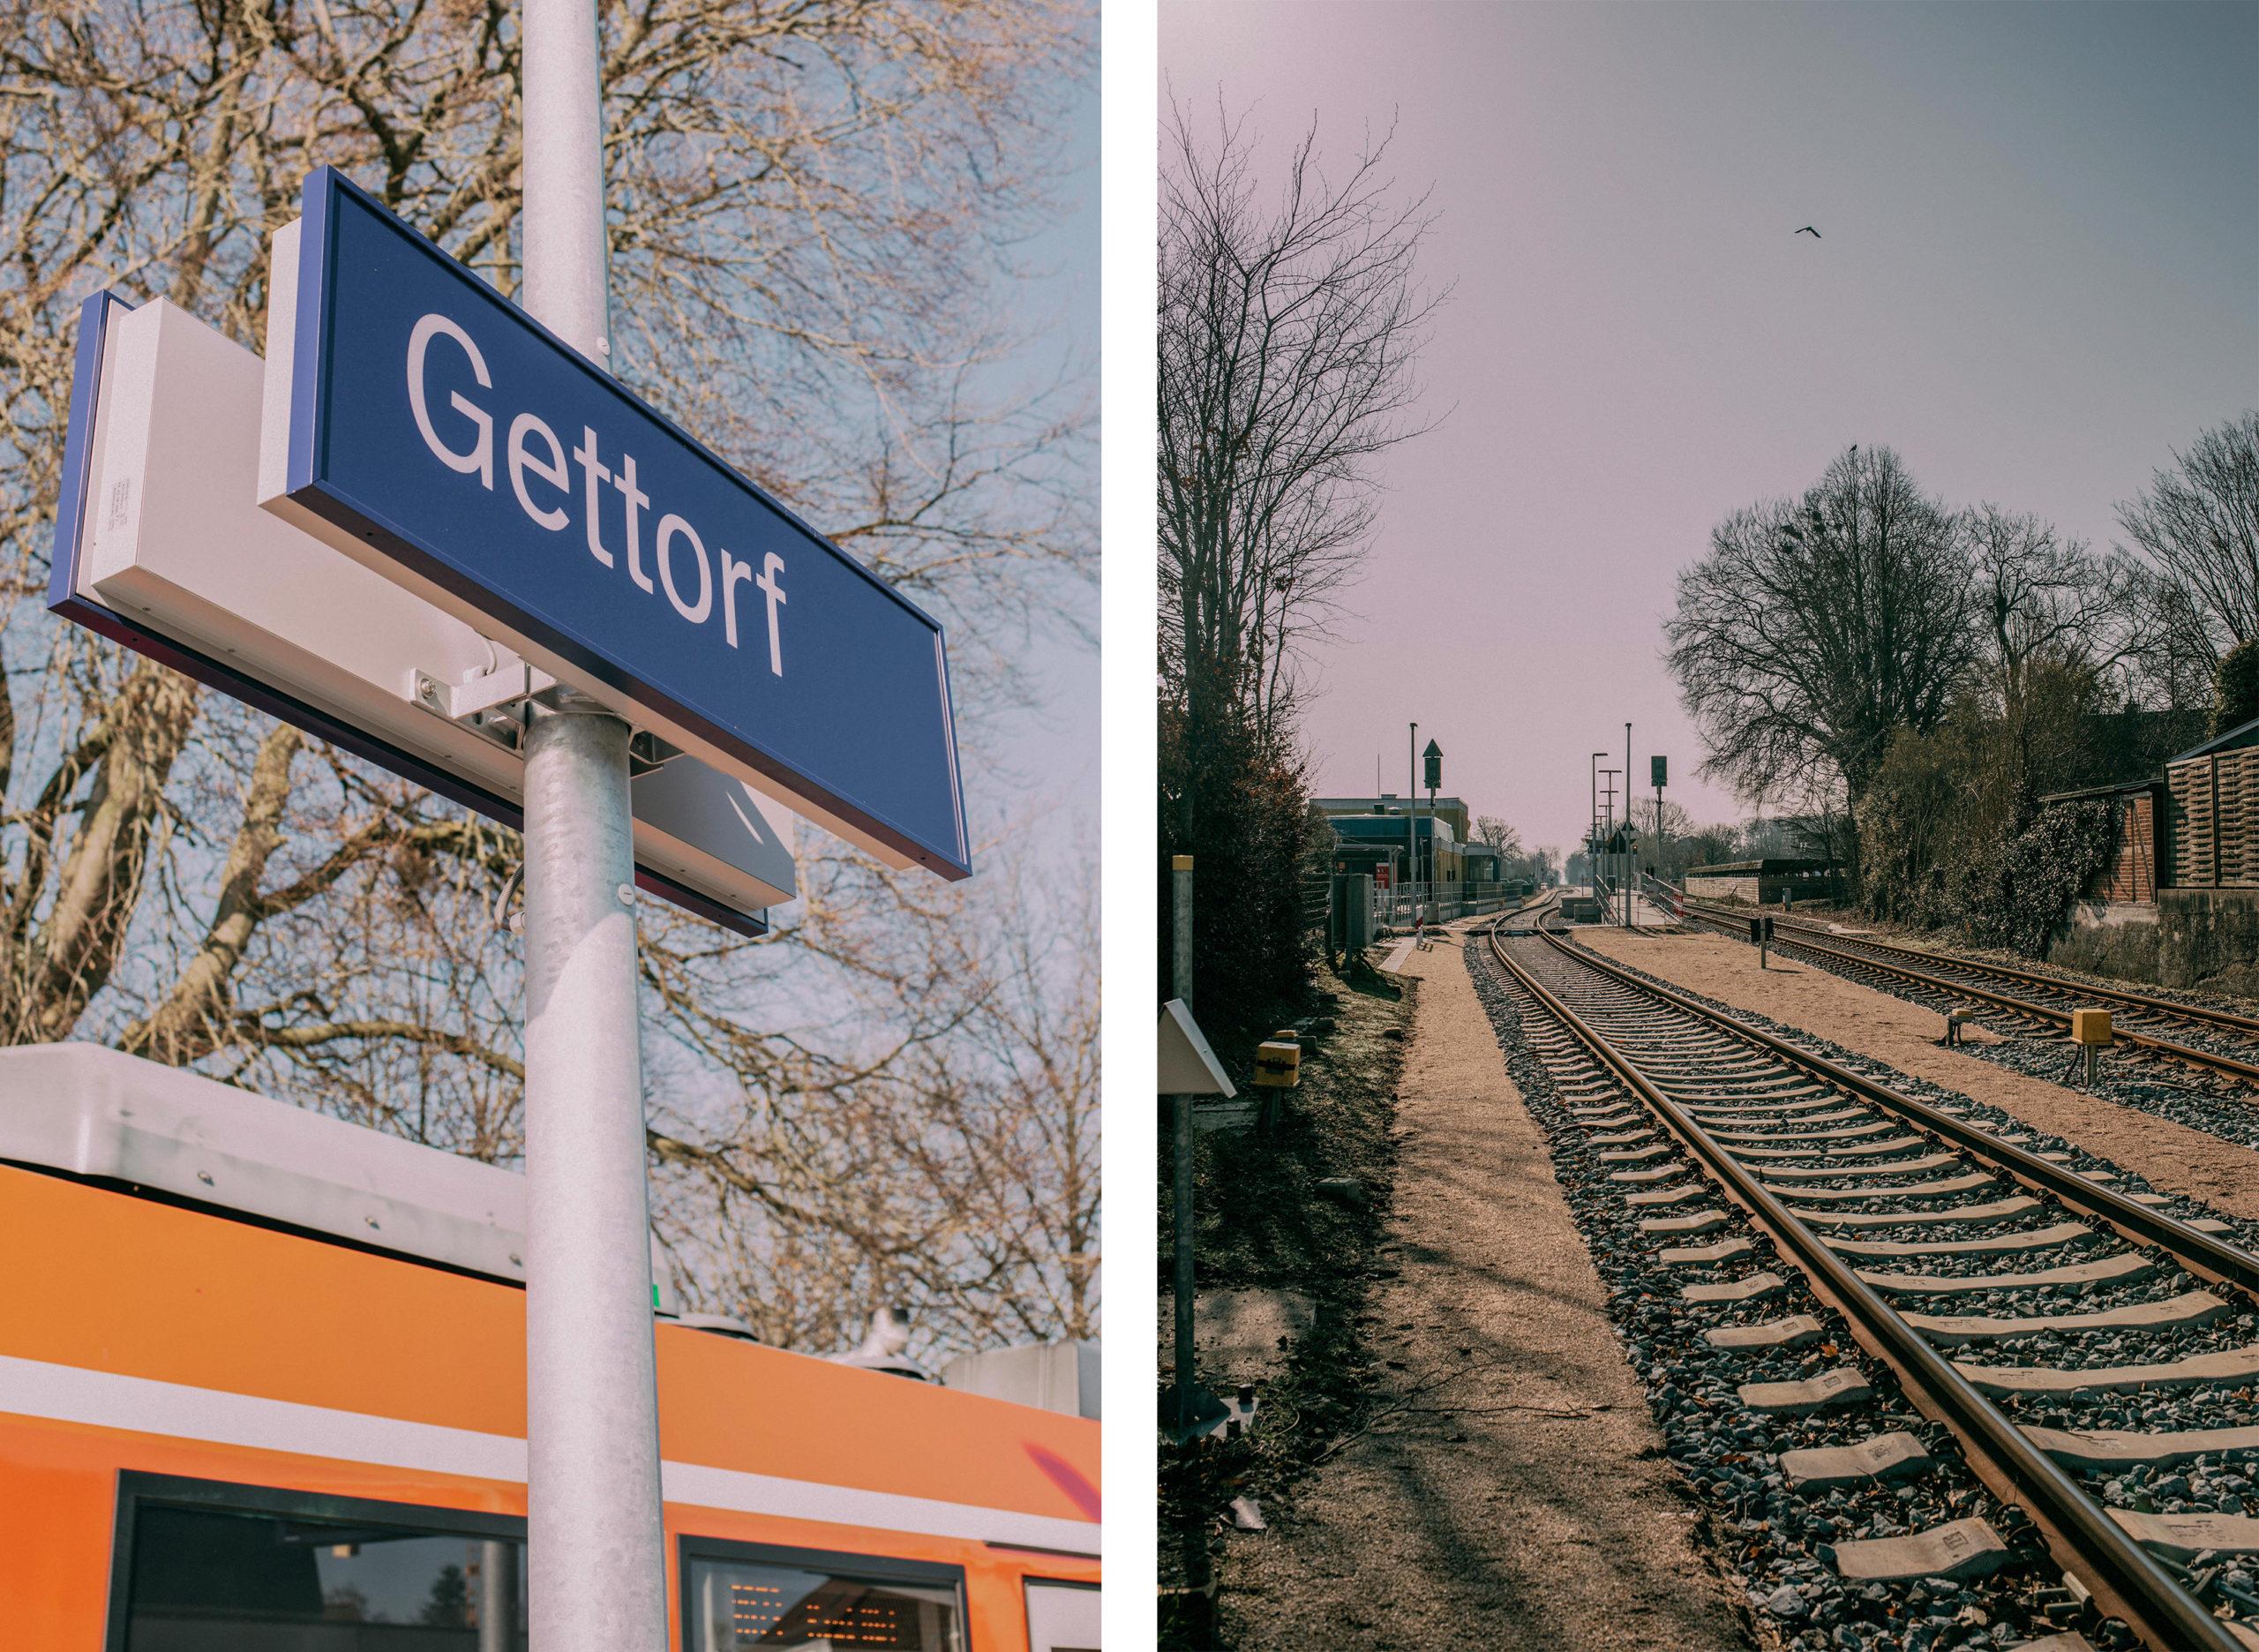 Bahnhof Gettorf